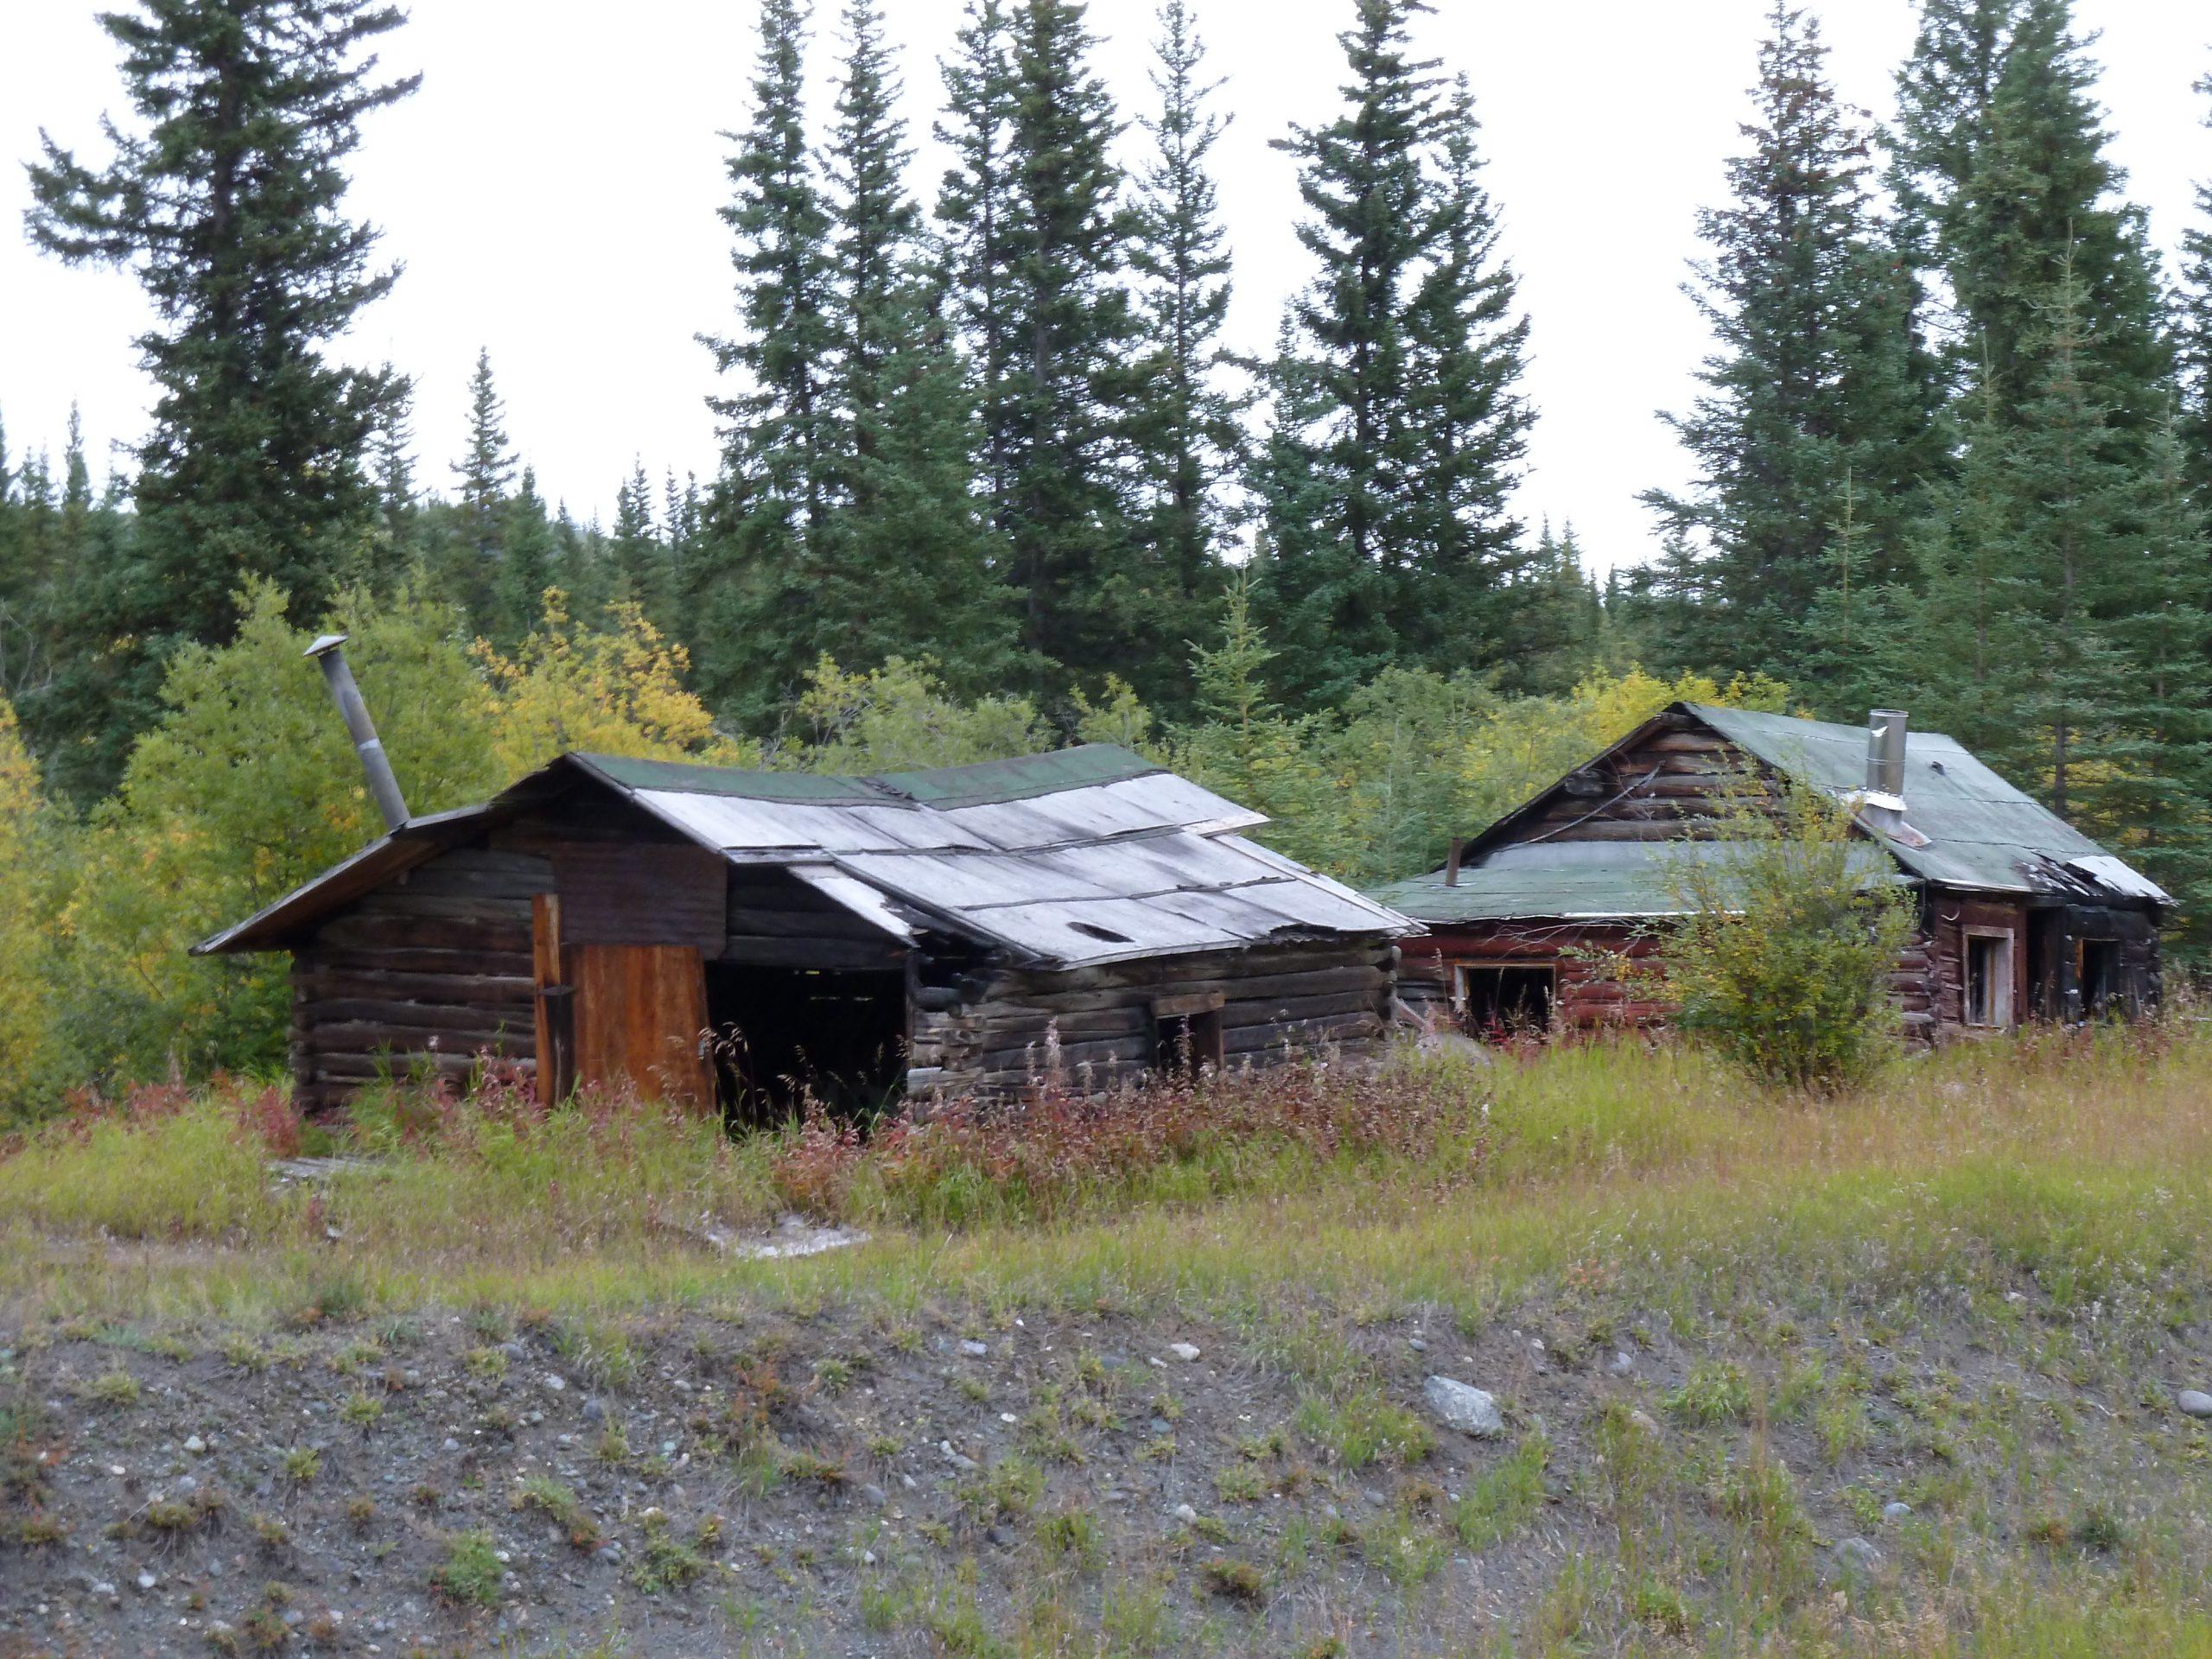 Radreise Alaska 2010 - Alte Goldgräberhütten